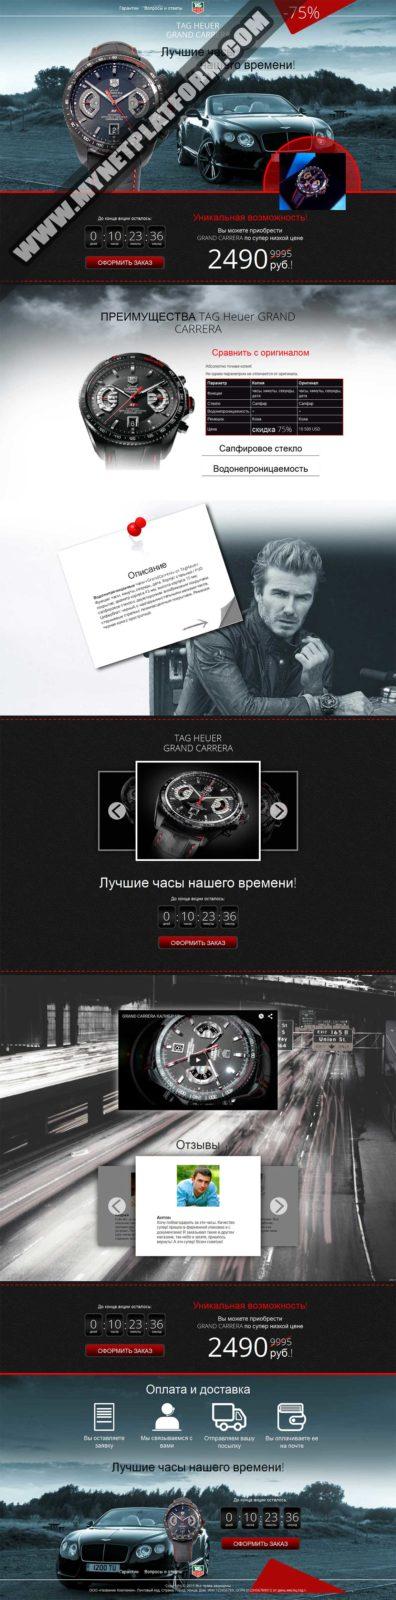 Скриншот Лендинга Часы Tag Heuer Grand Carrera 001